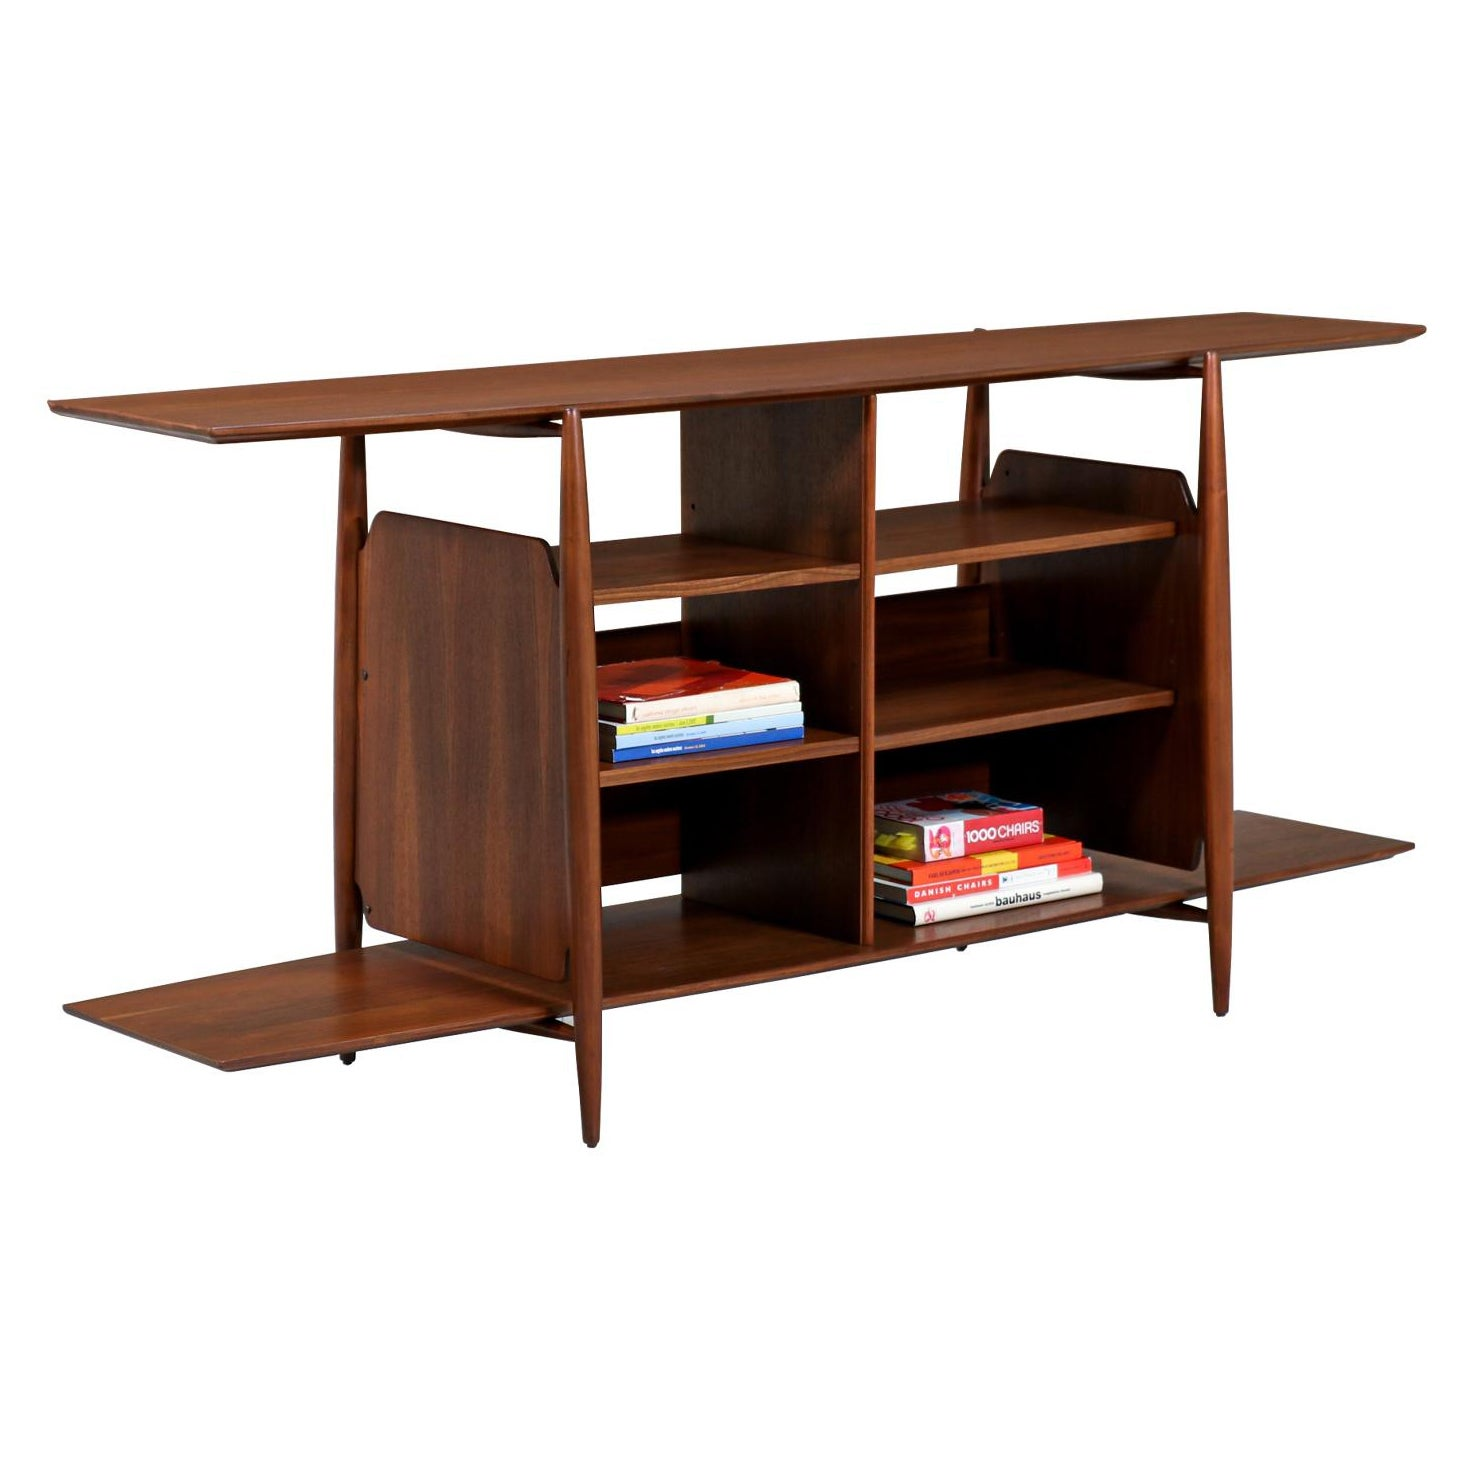 Mid-Century Modern Walnut Tier Bookshelf